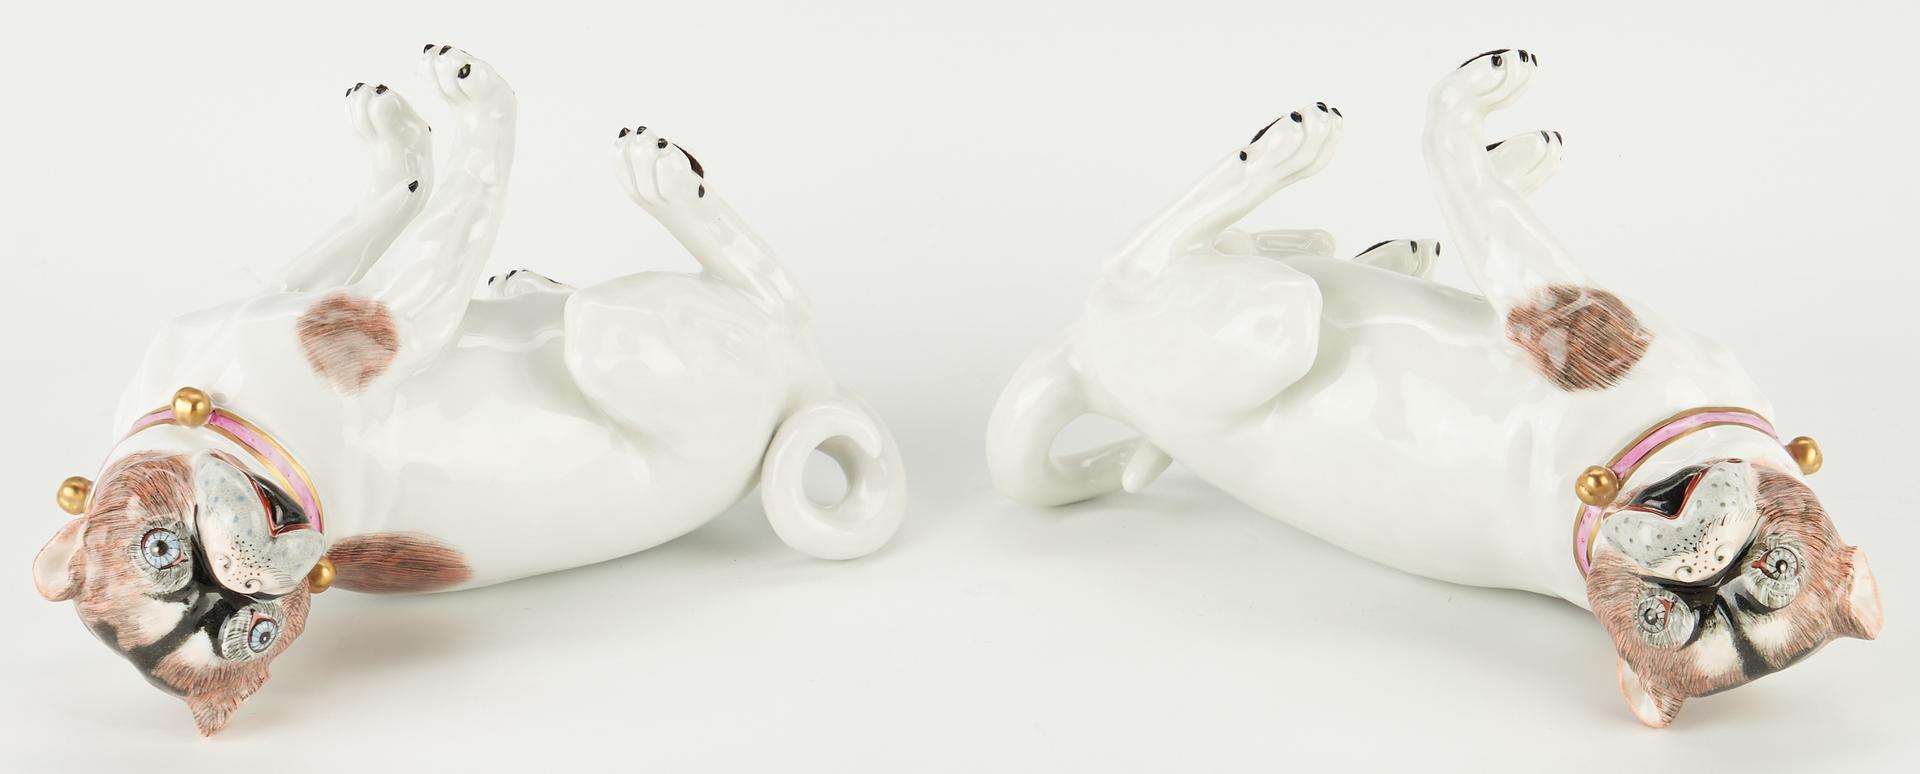 Lot 330: Pair of Dresden Porcelain Pug Dogs